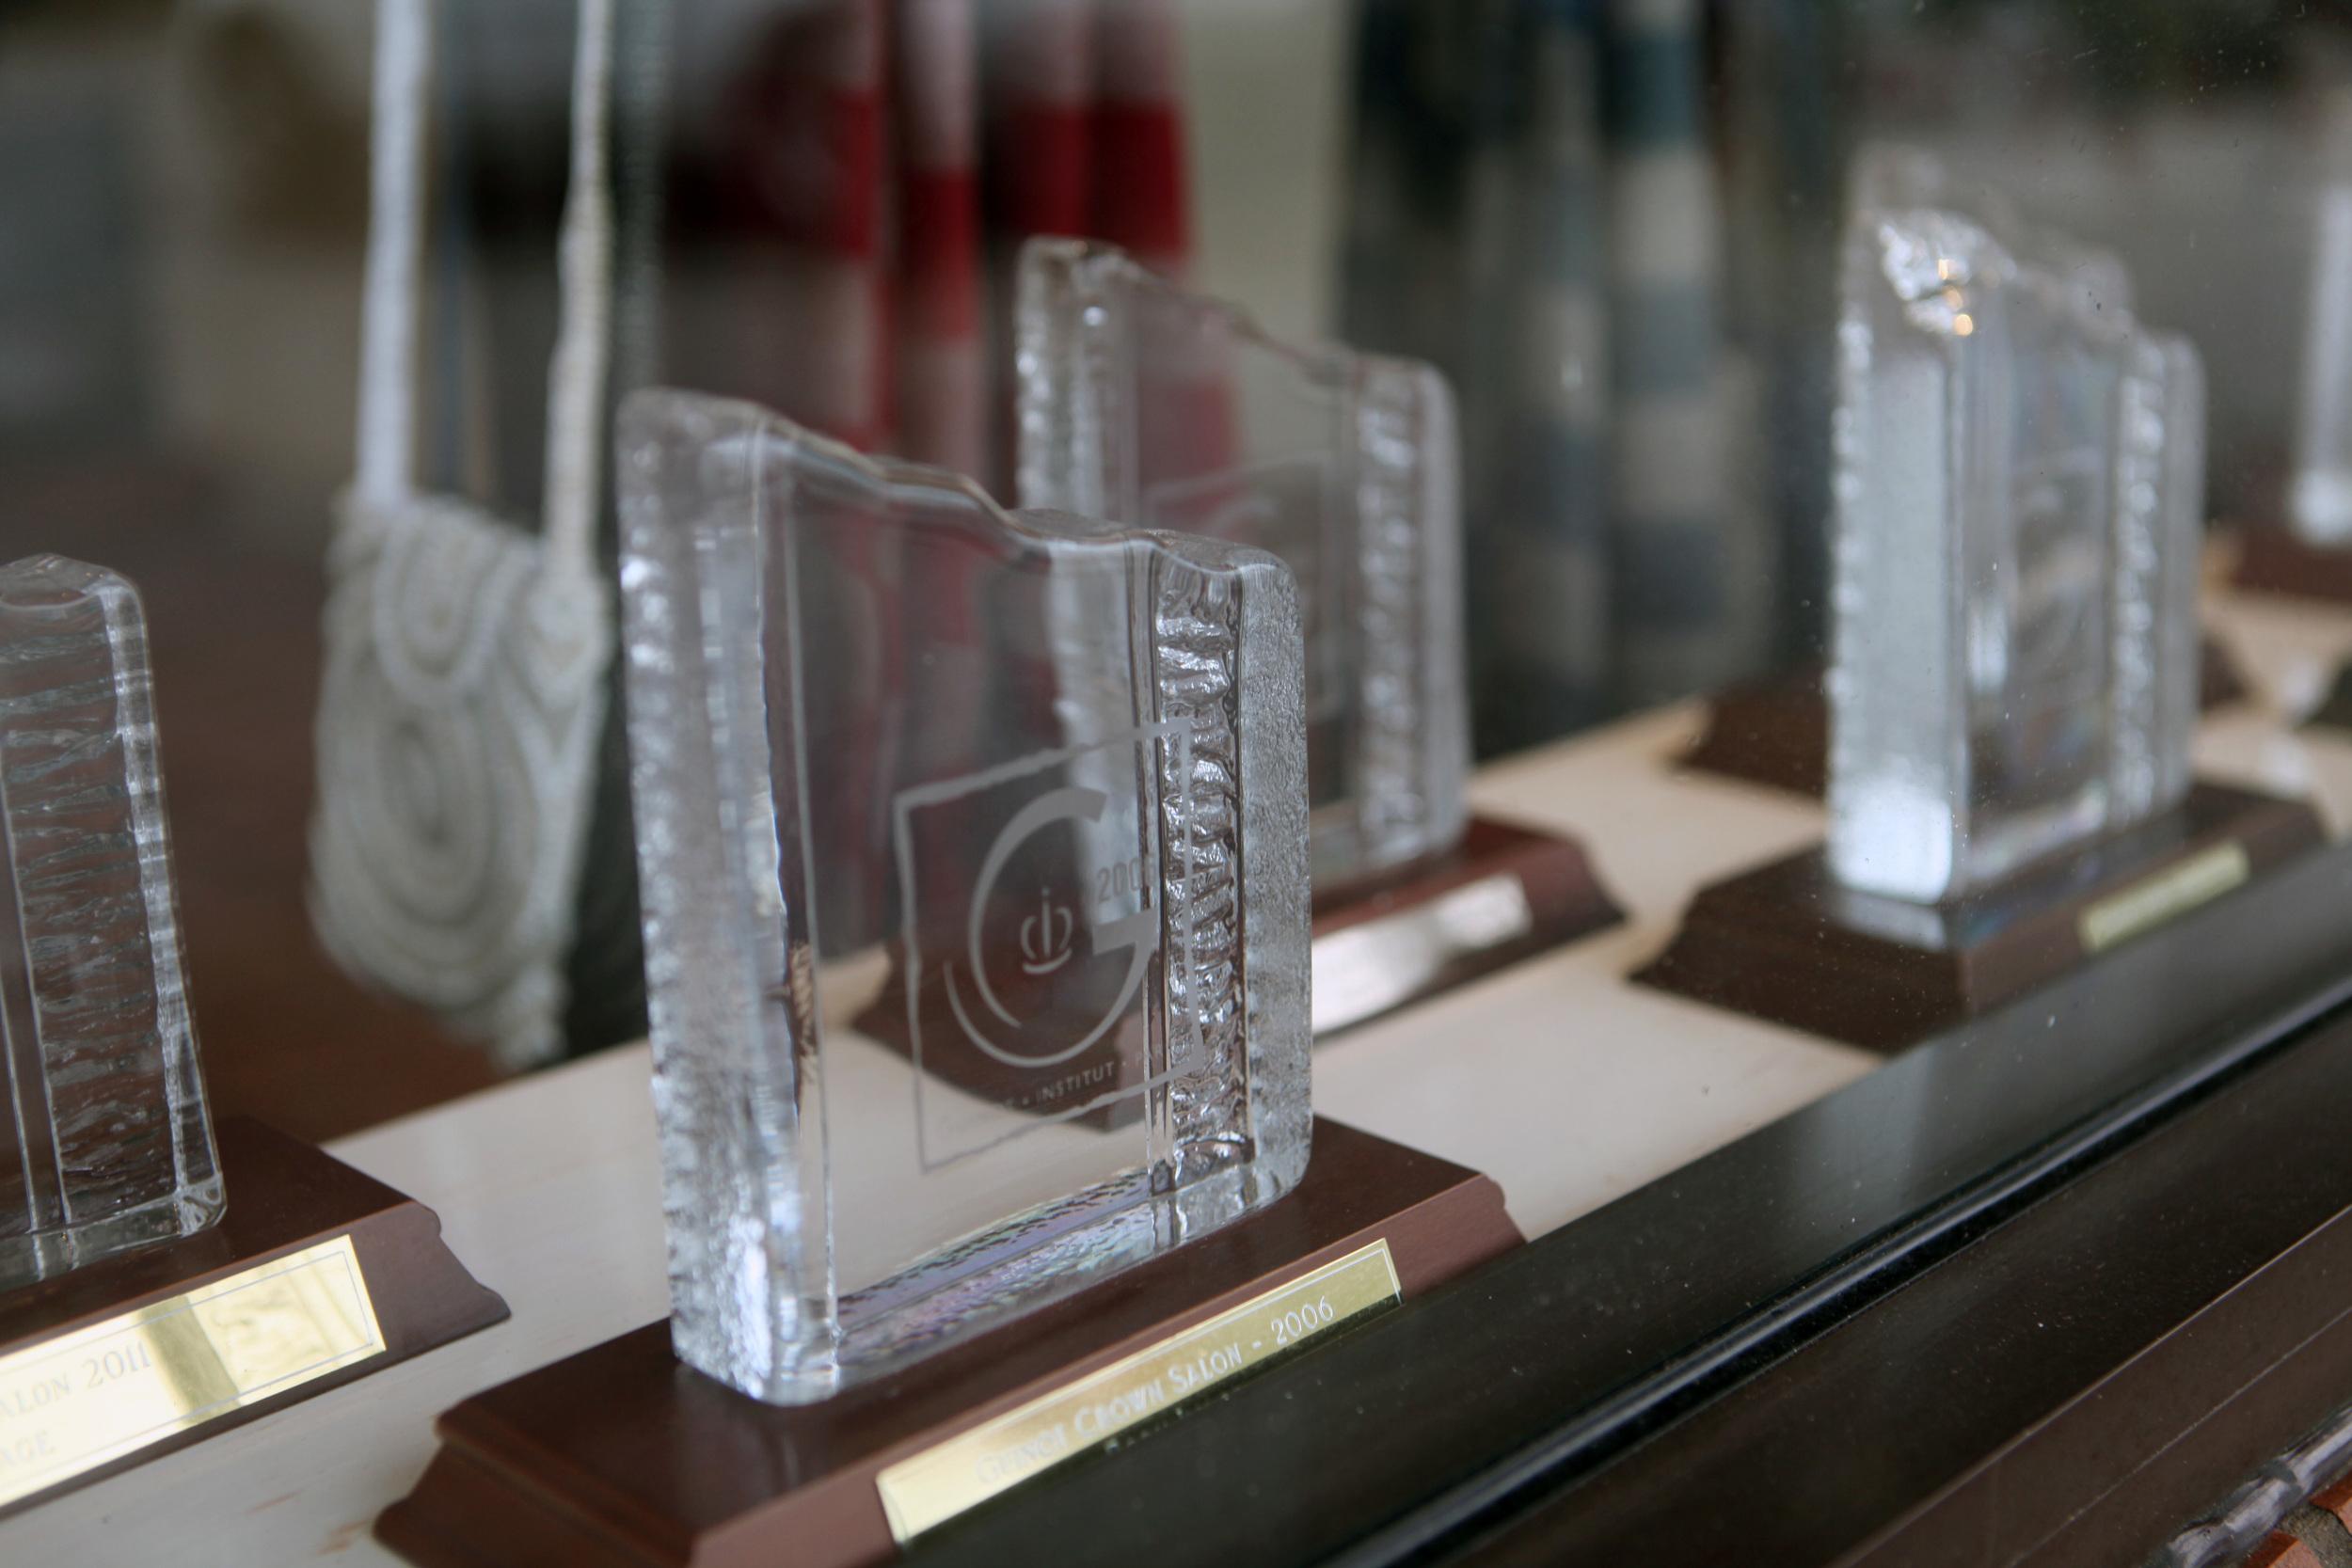 Guinot Crown Salon Award Winners 2000 to 2017